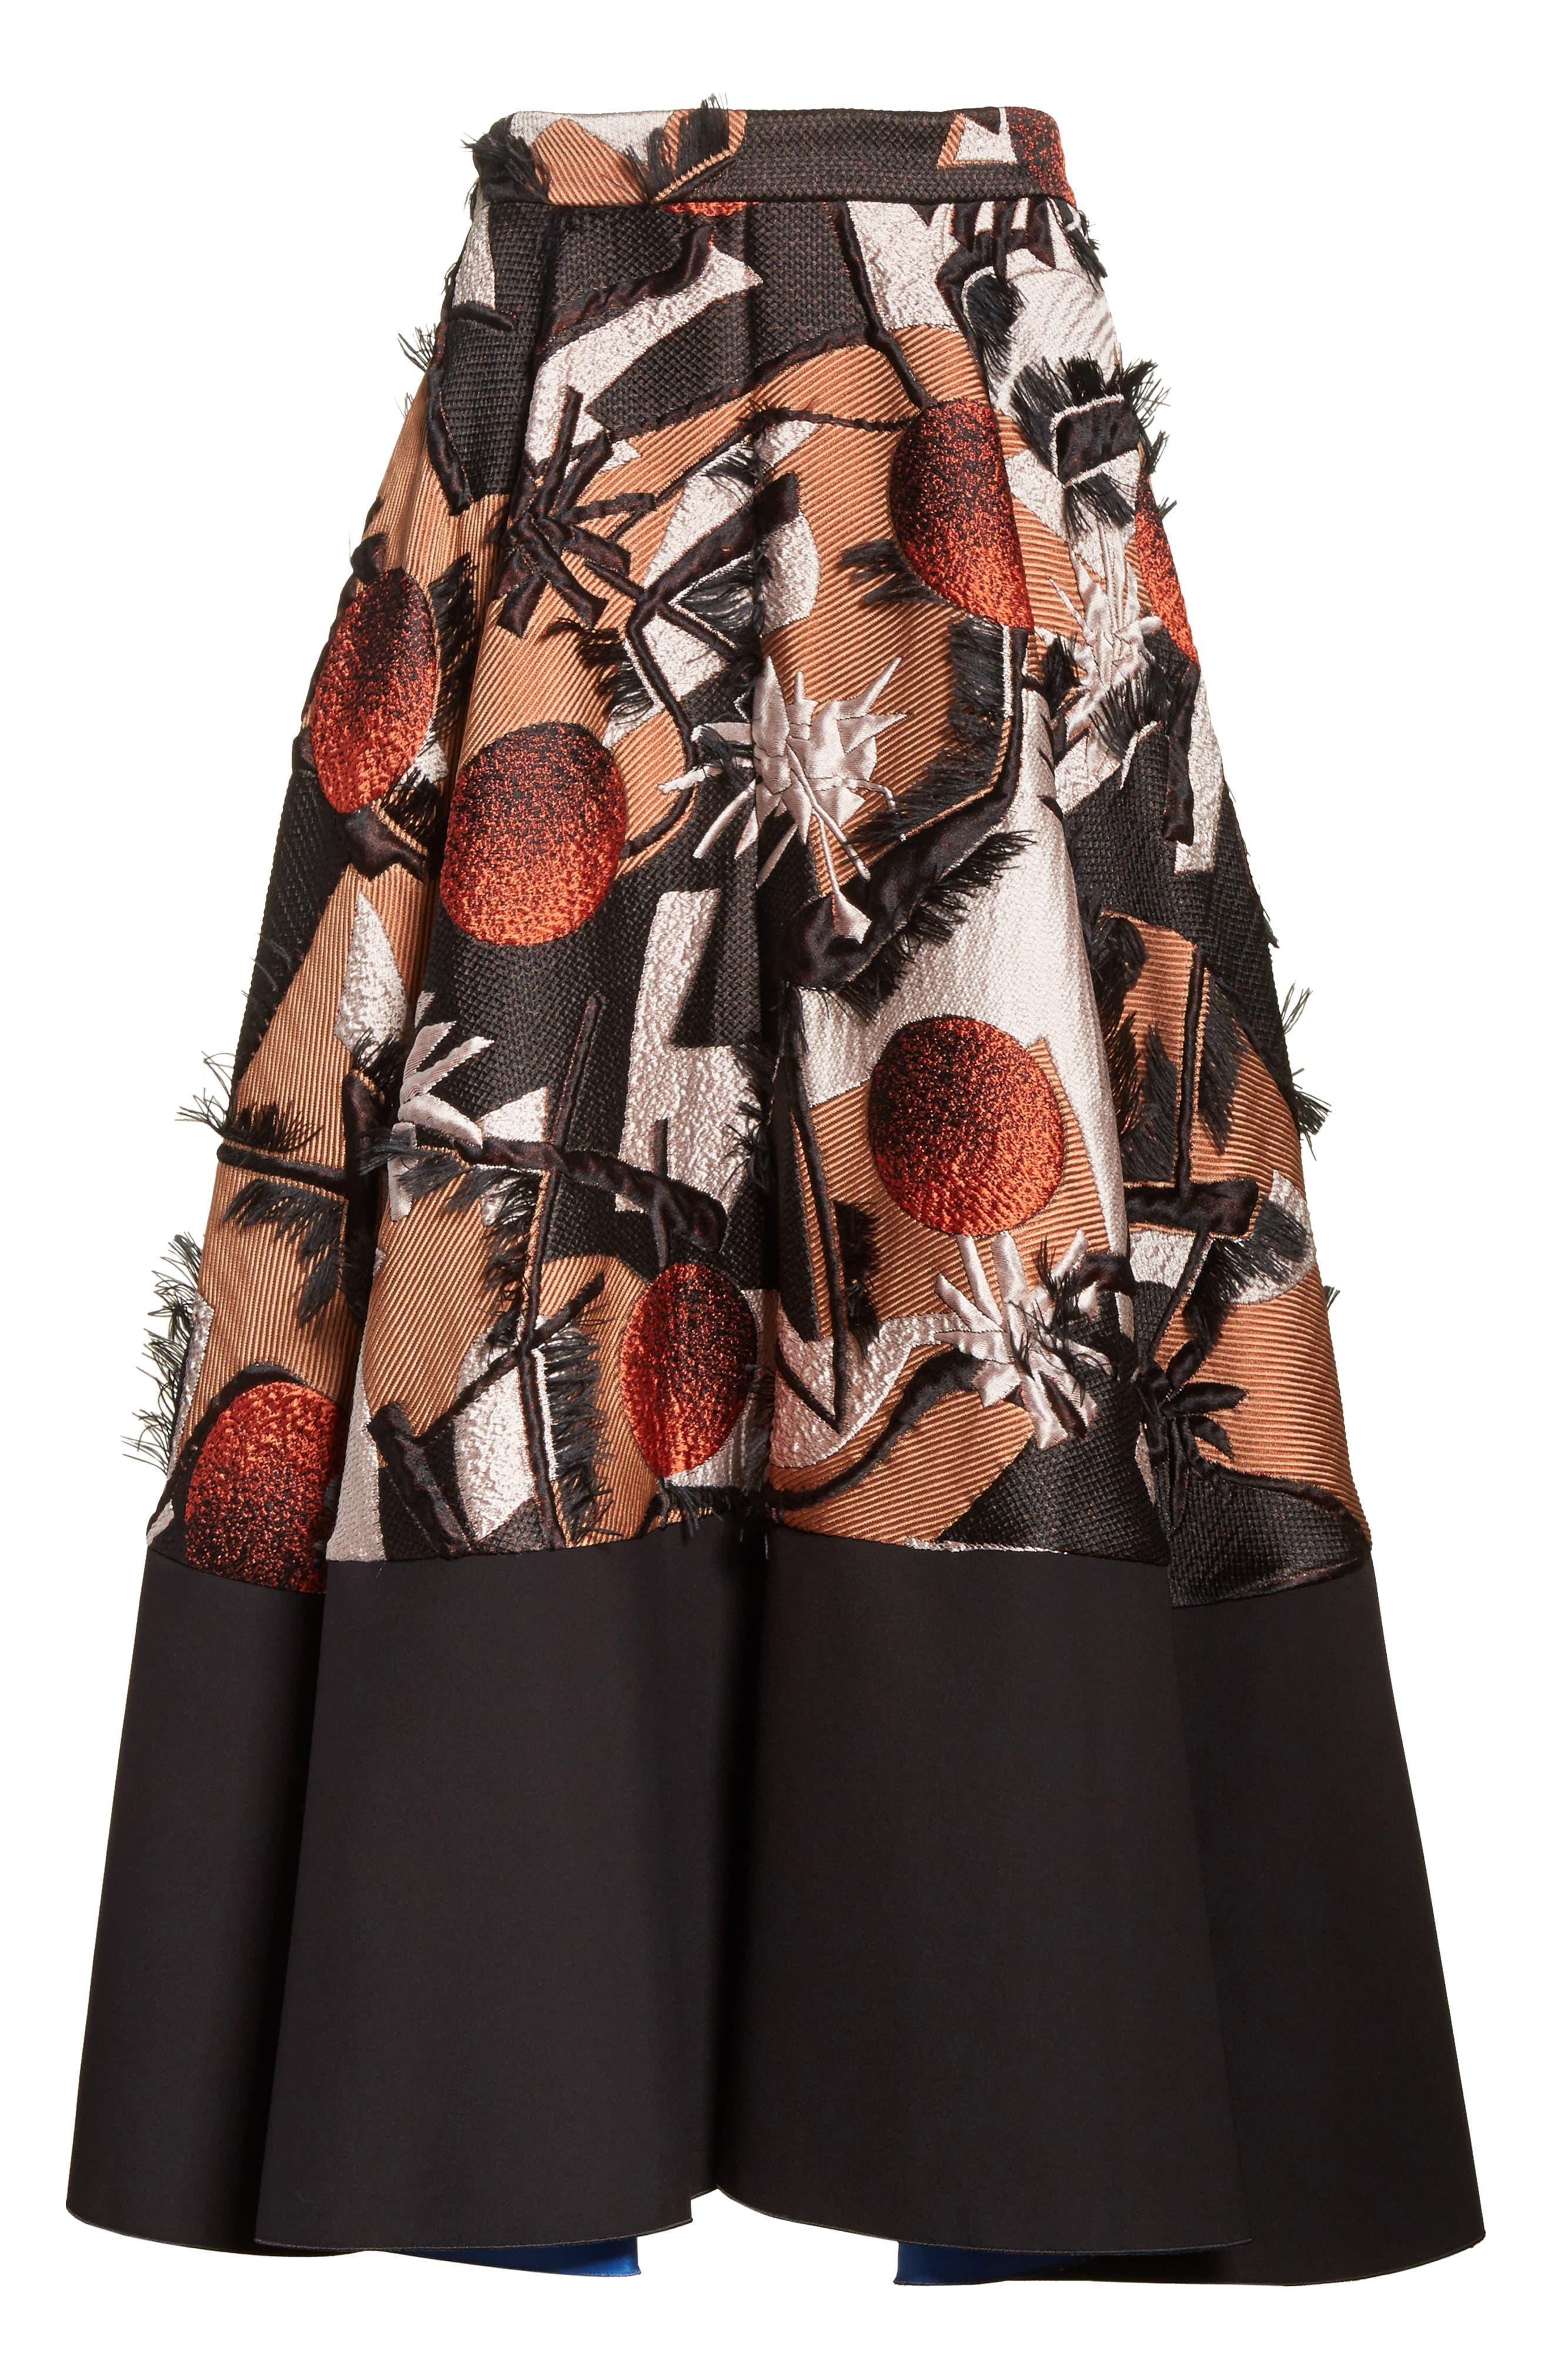 Sharpin Silk Blend Jacquard Skirt,                             Alternate thumbnail 6, color,                             Black Orange Blue